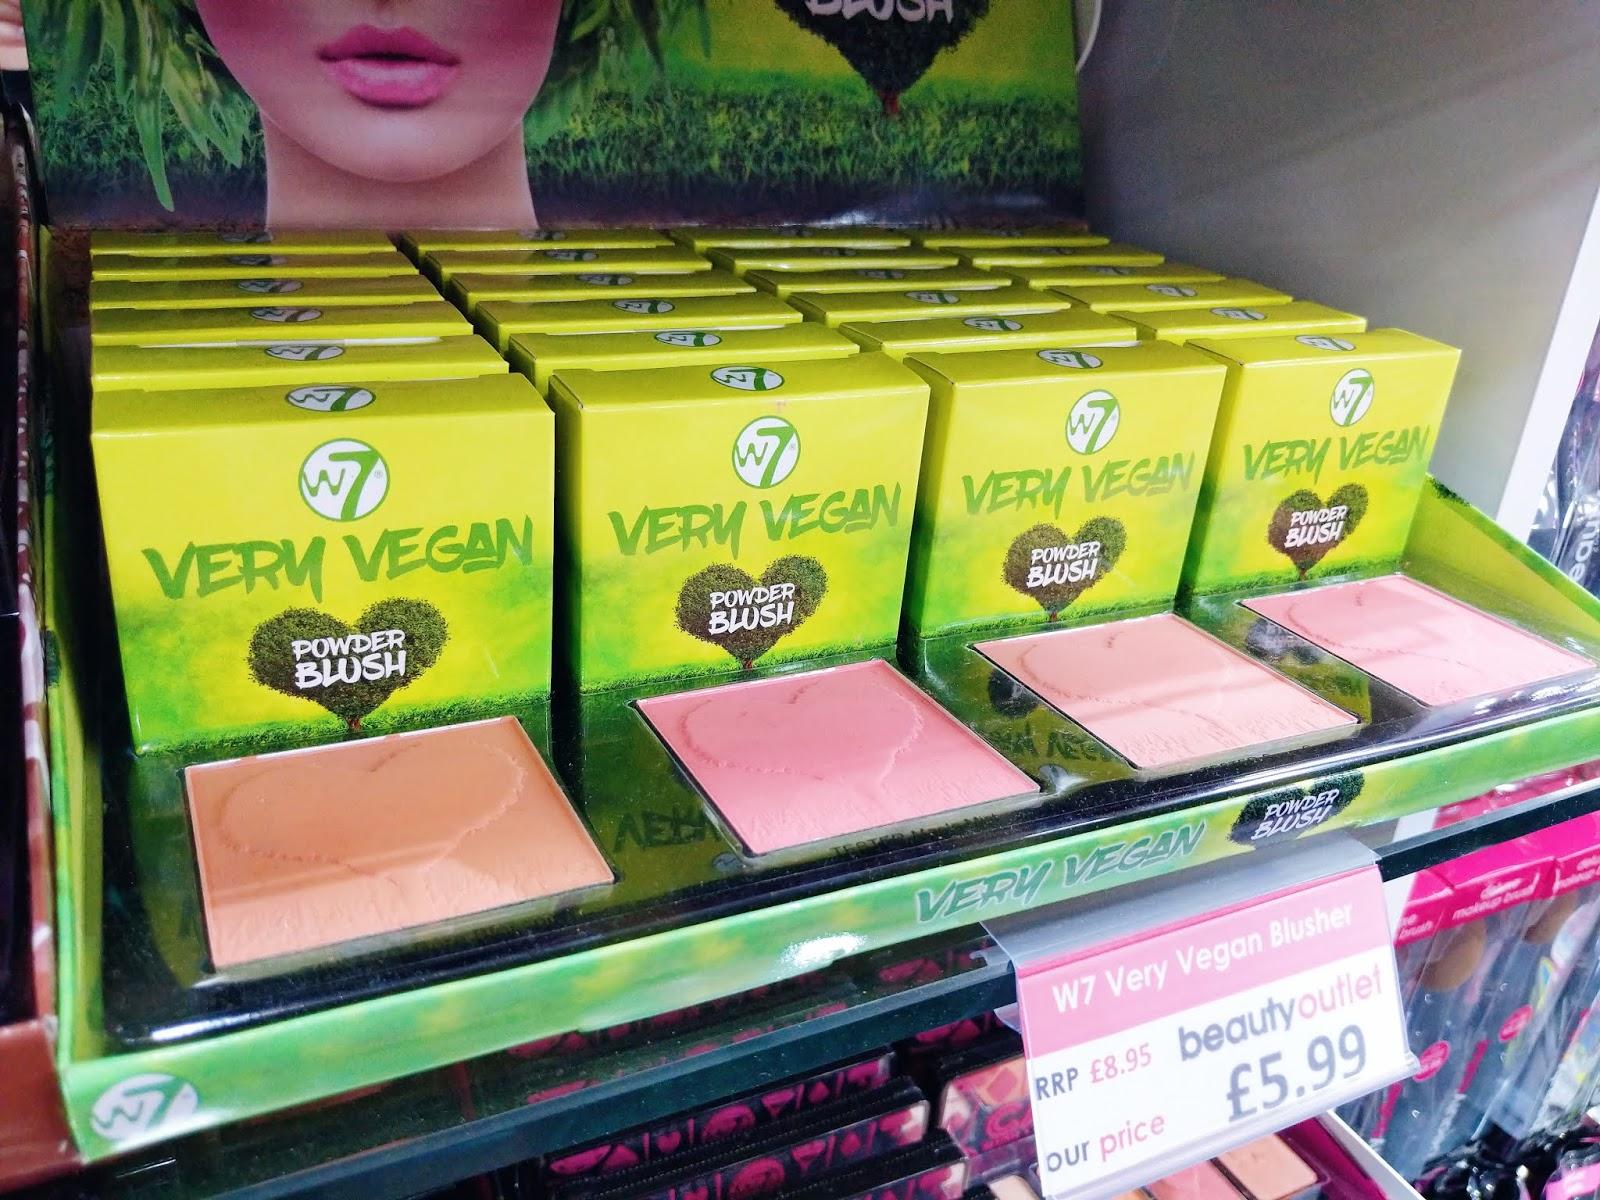 W7_Cosmetics_Vegan_Blusher